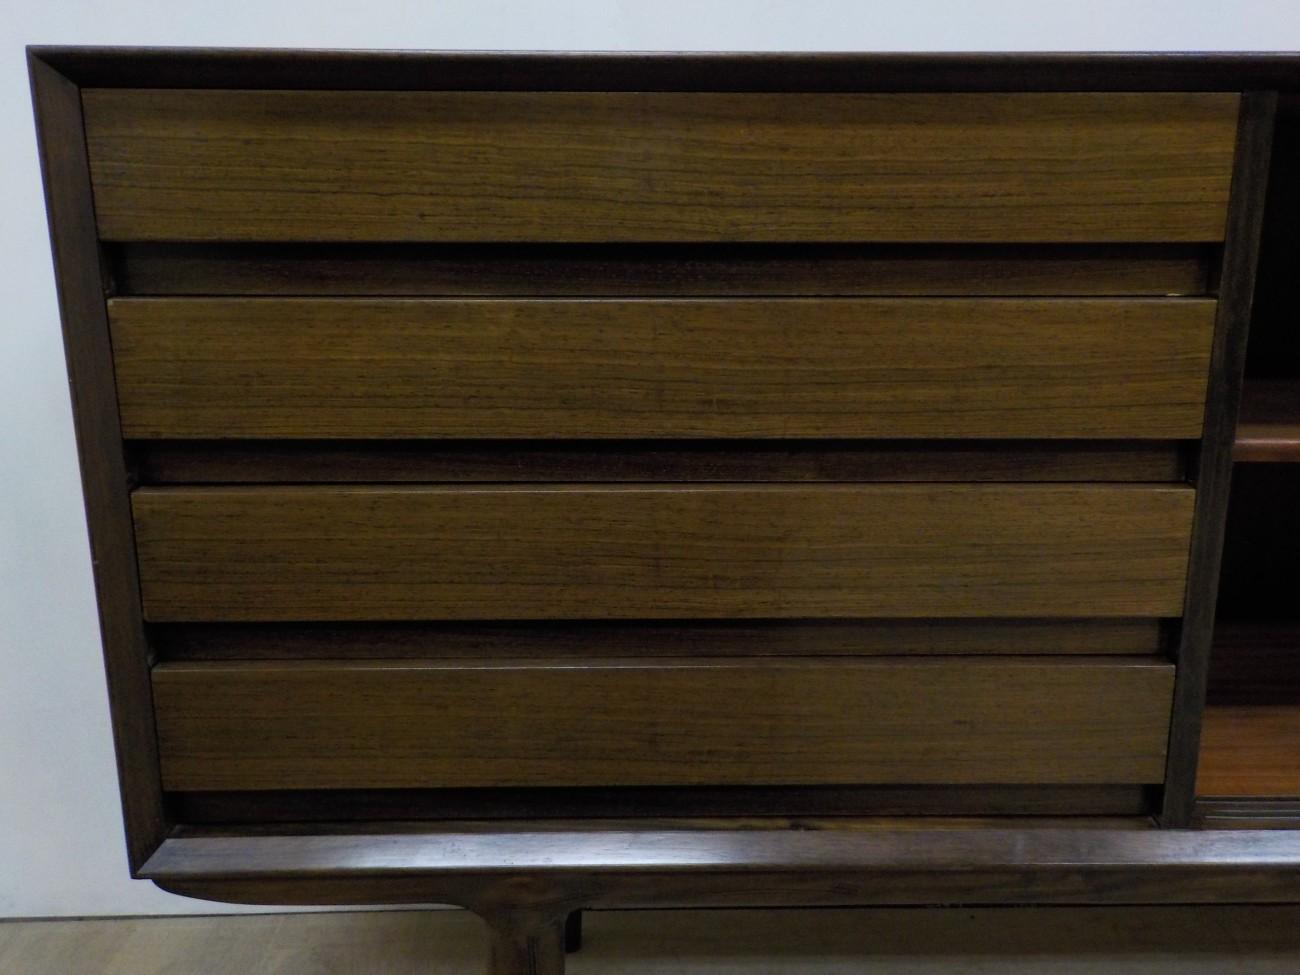 Gunni Omann Sideboard / ローズウッド  グンニオマーン サイドボード stock2012-1